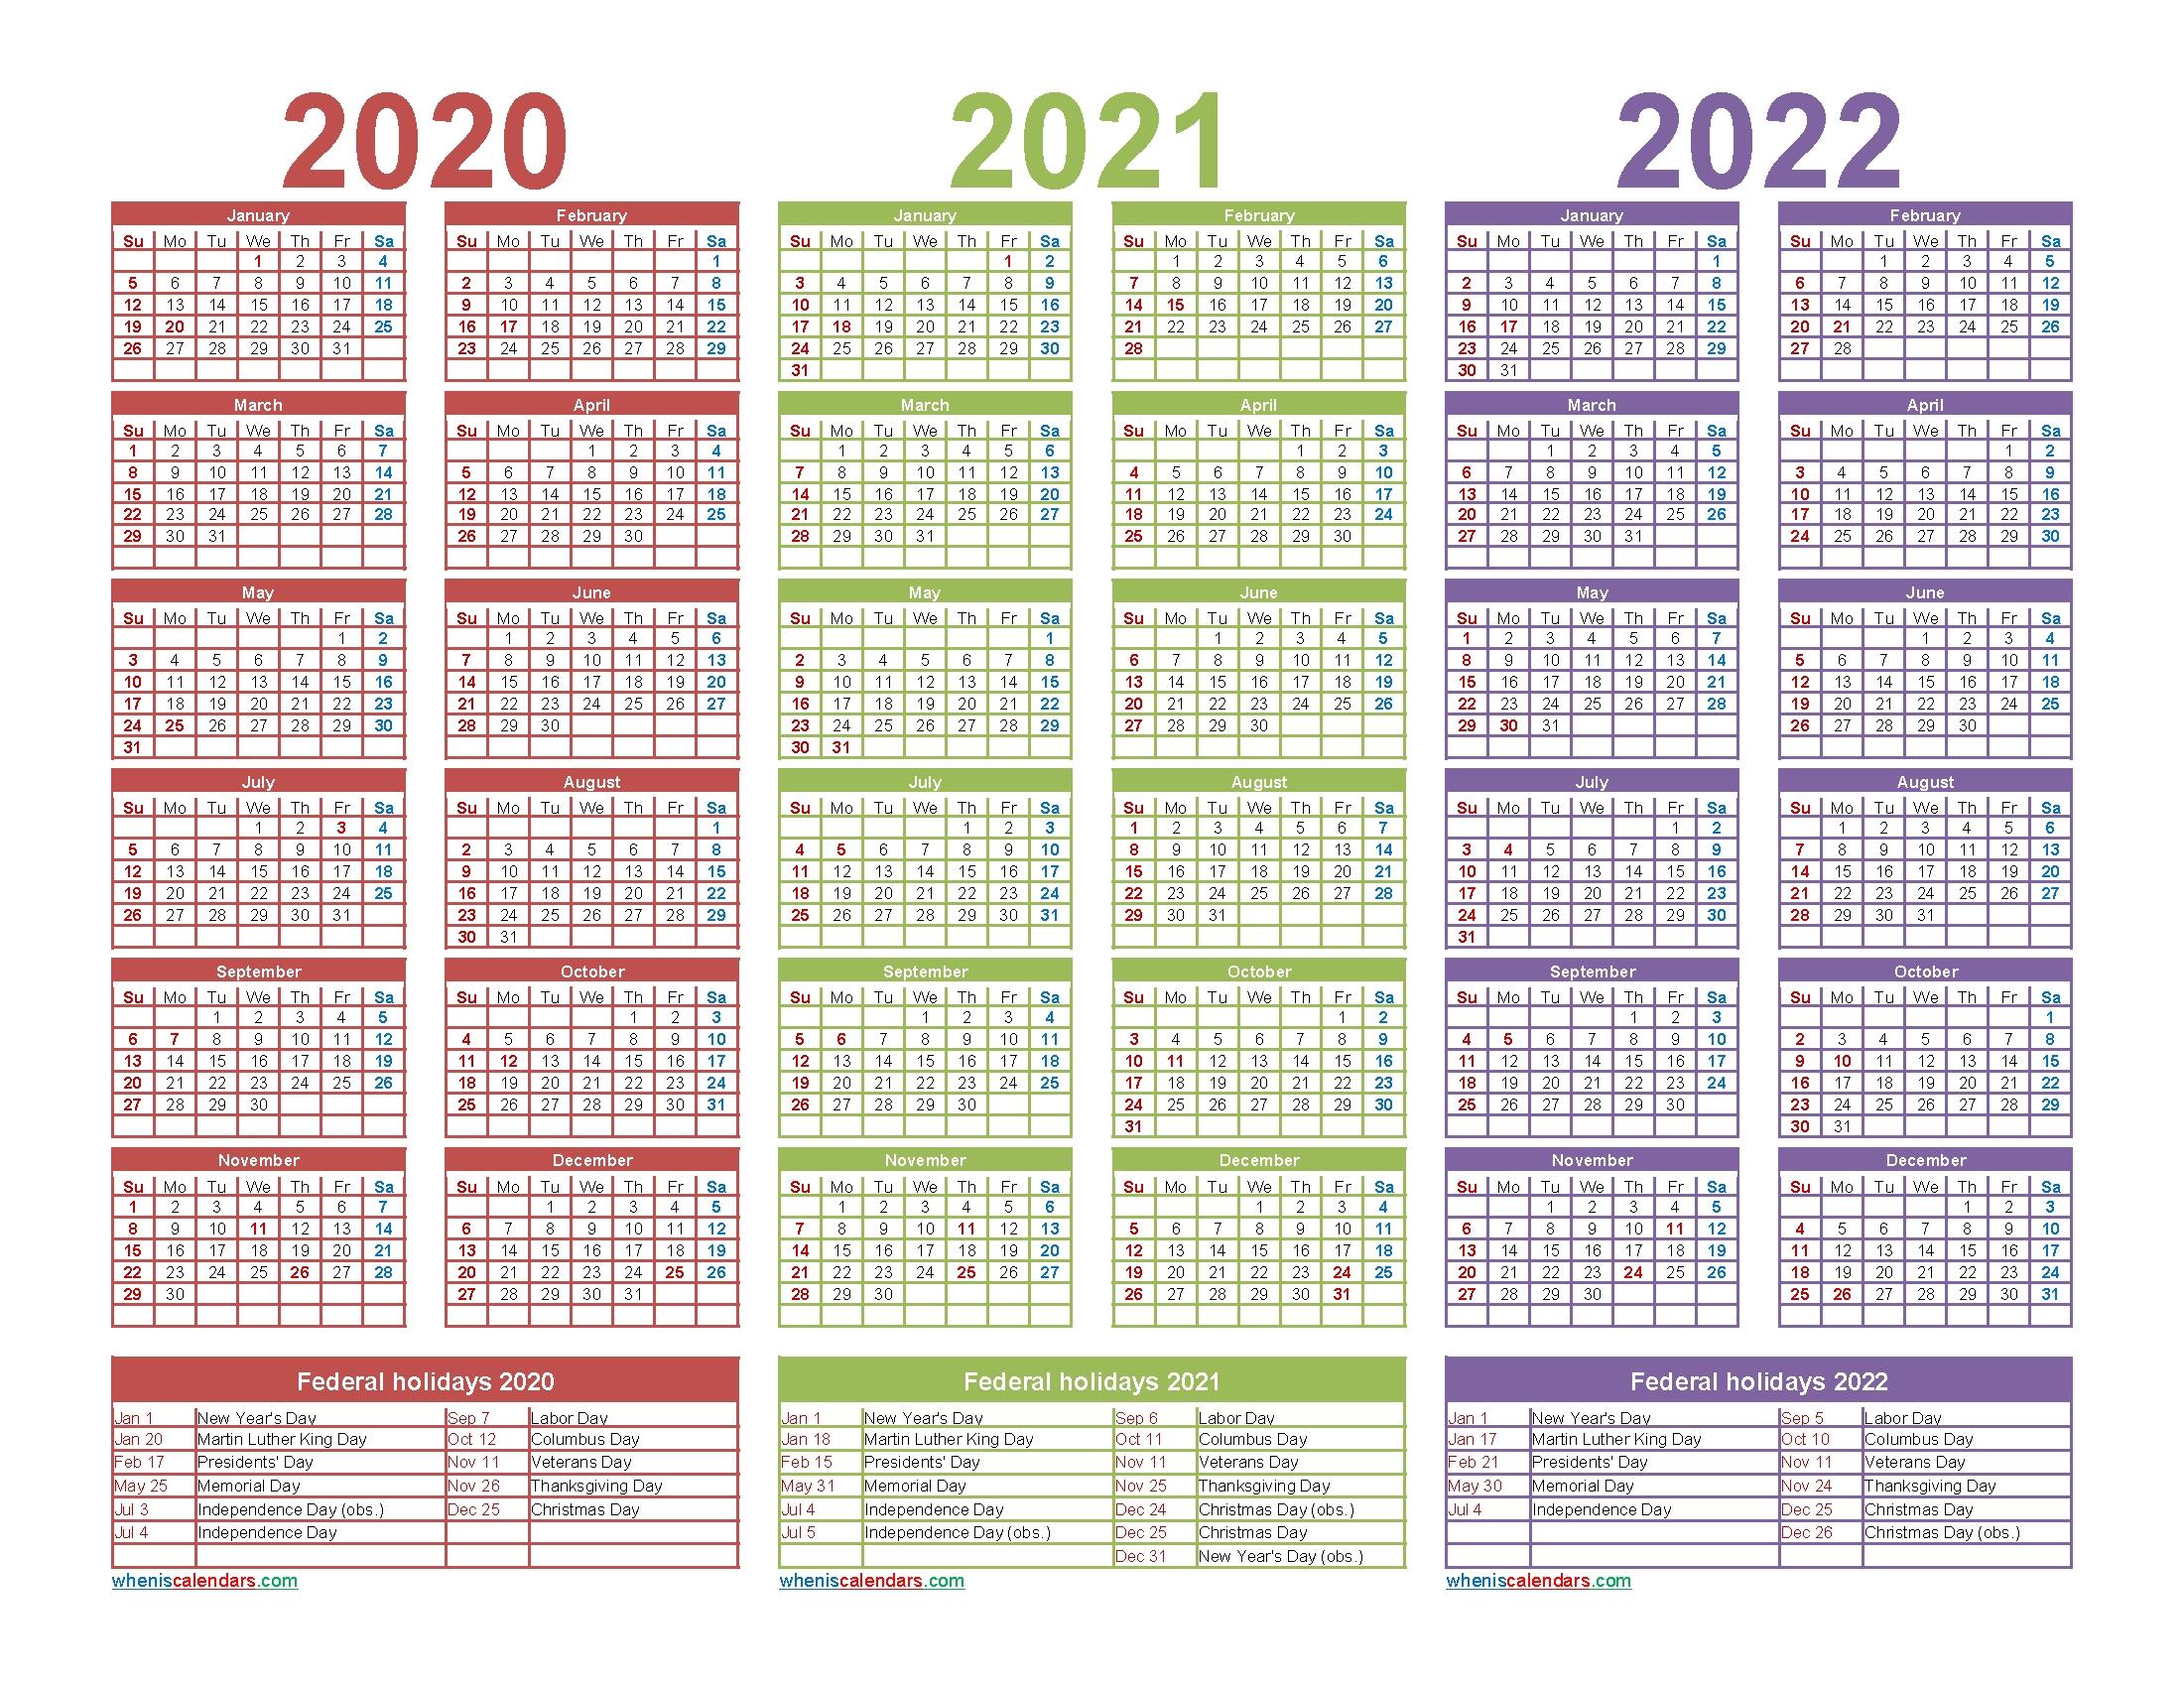 4 Year Calendar 2020 To 2022 | Month Calendar Printable inside 2021-2022 Three 3 Year Planner